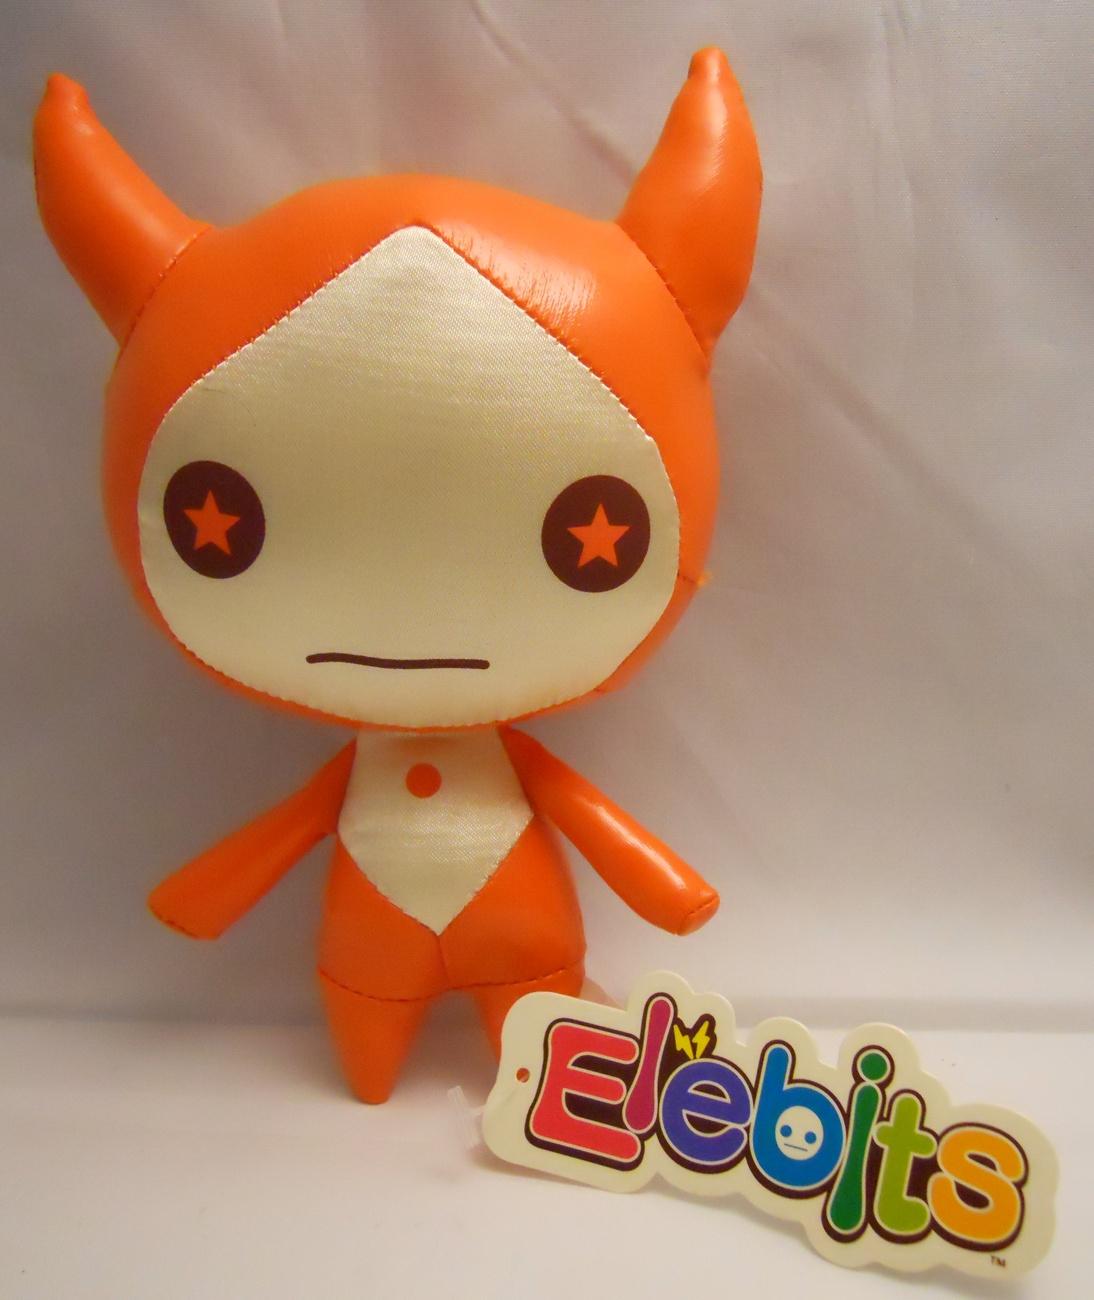 2006 Elebits Nintendo Wii Orange Character Doll Promo